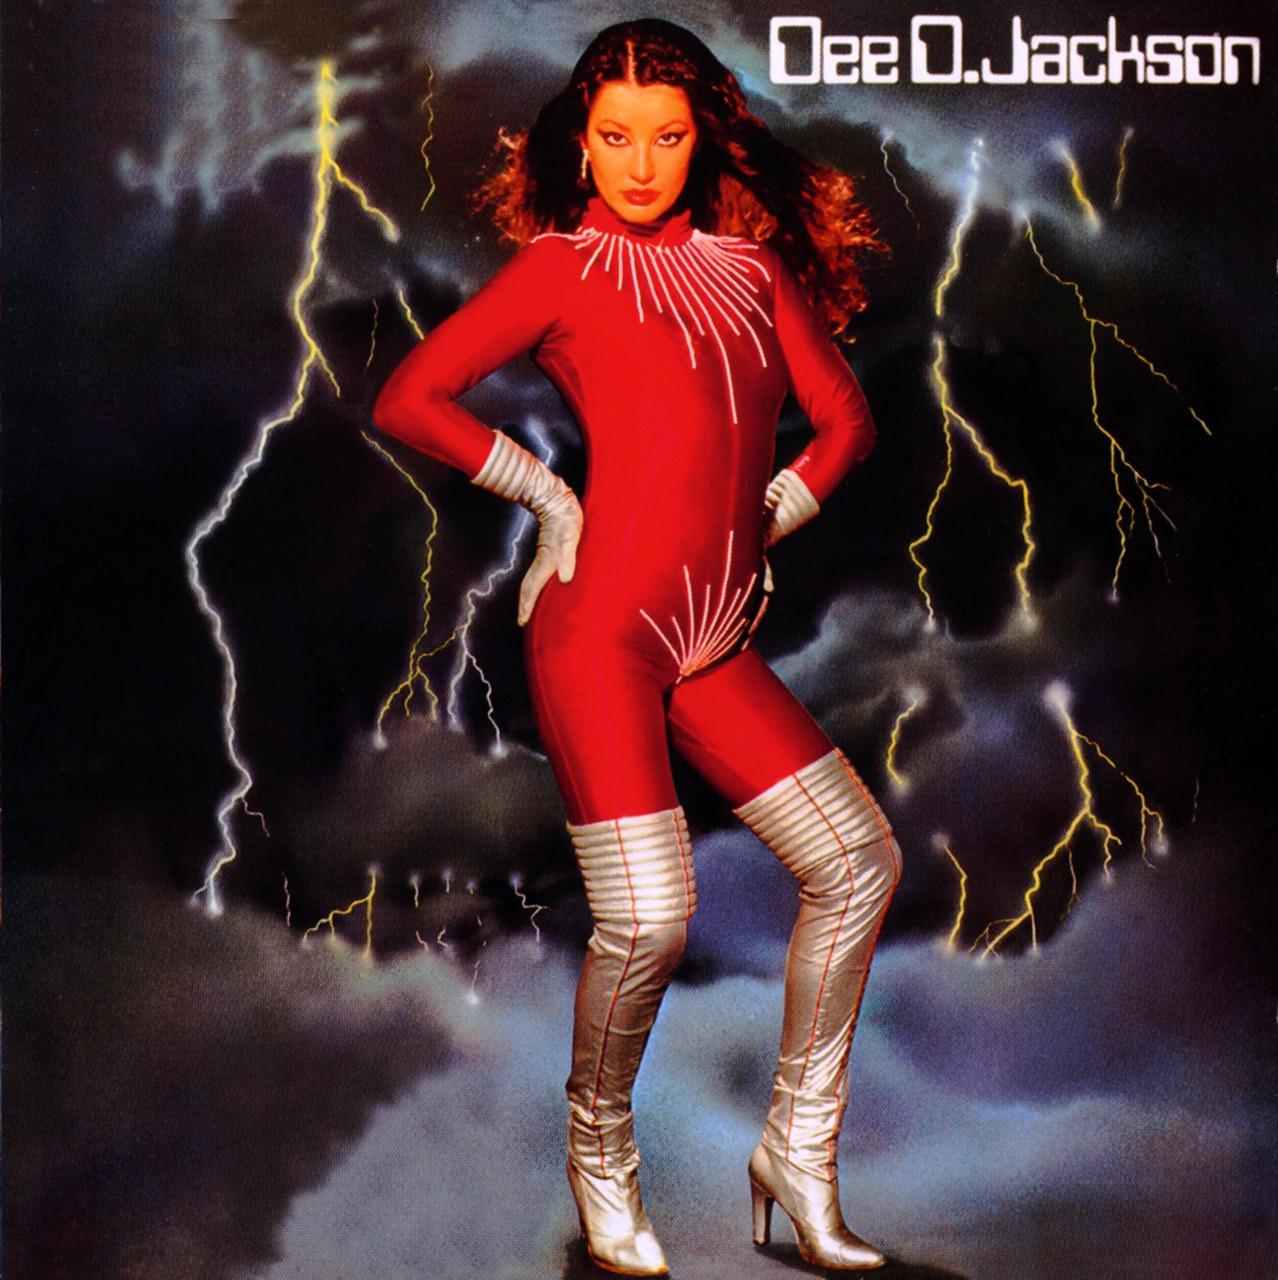 dee d.jackson